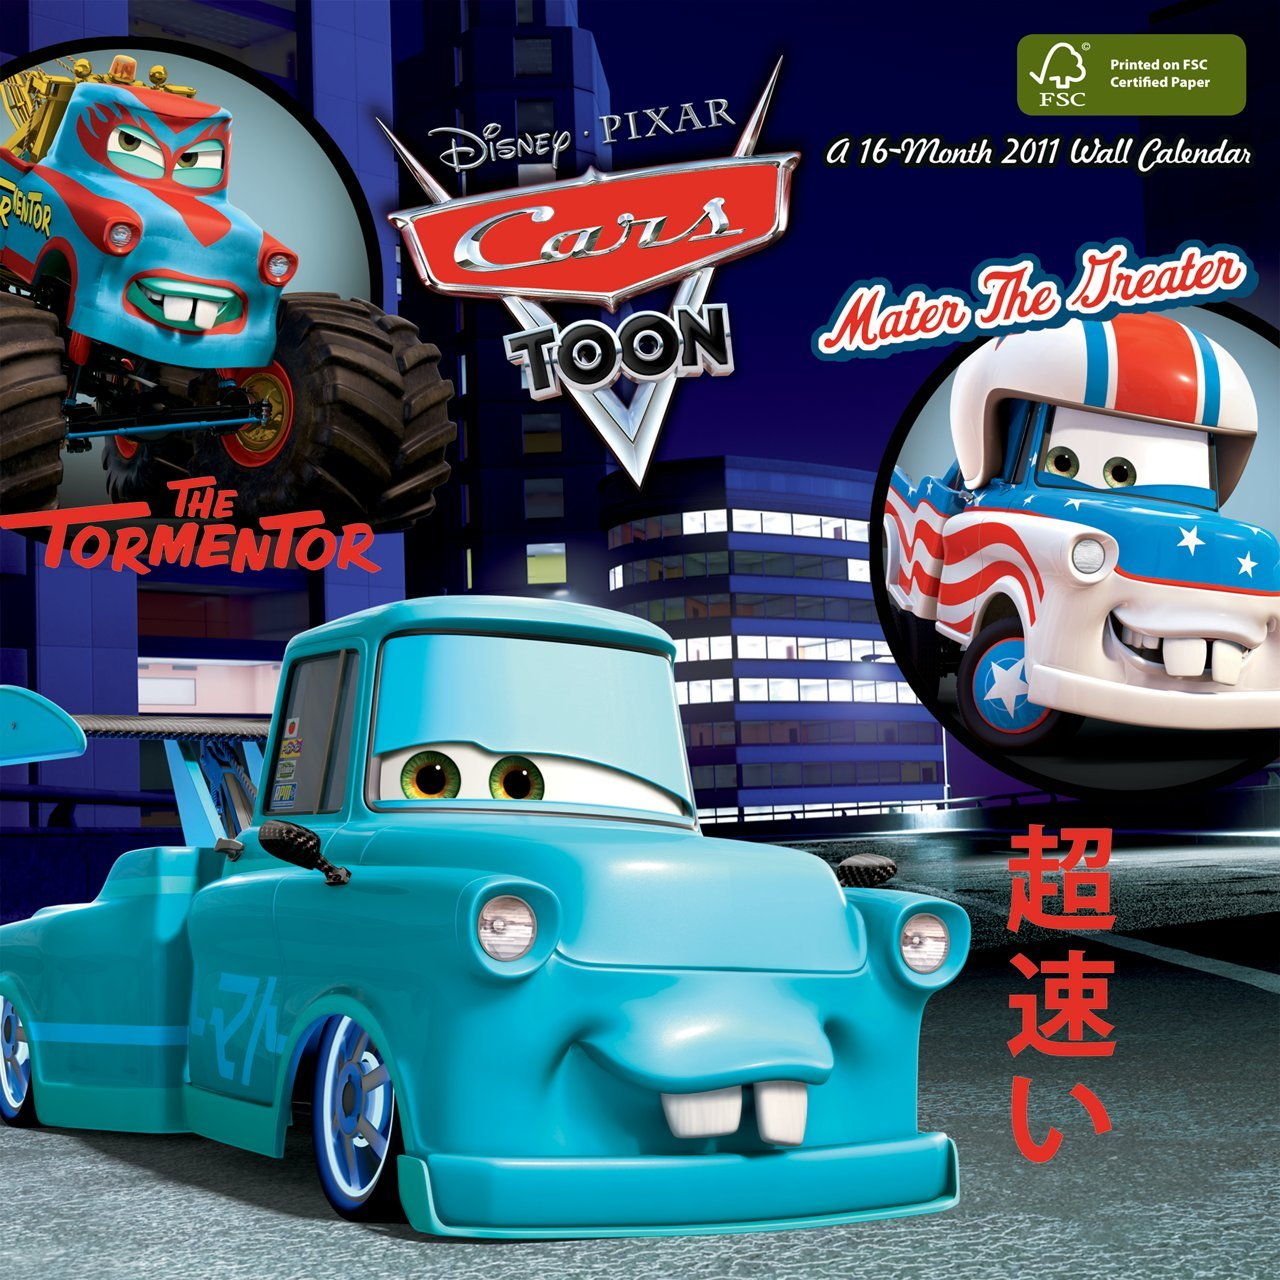 Disney Pixar Cars Toon 2011 Wall Calendar